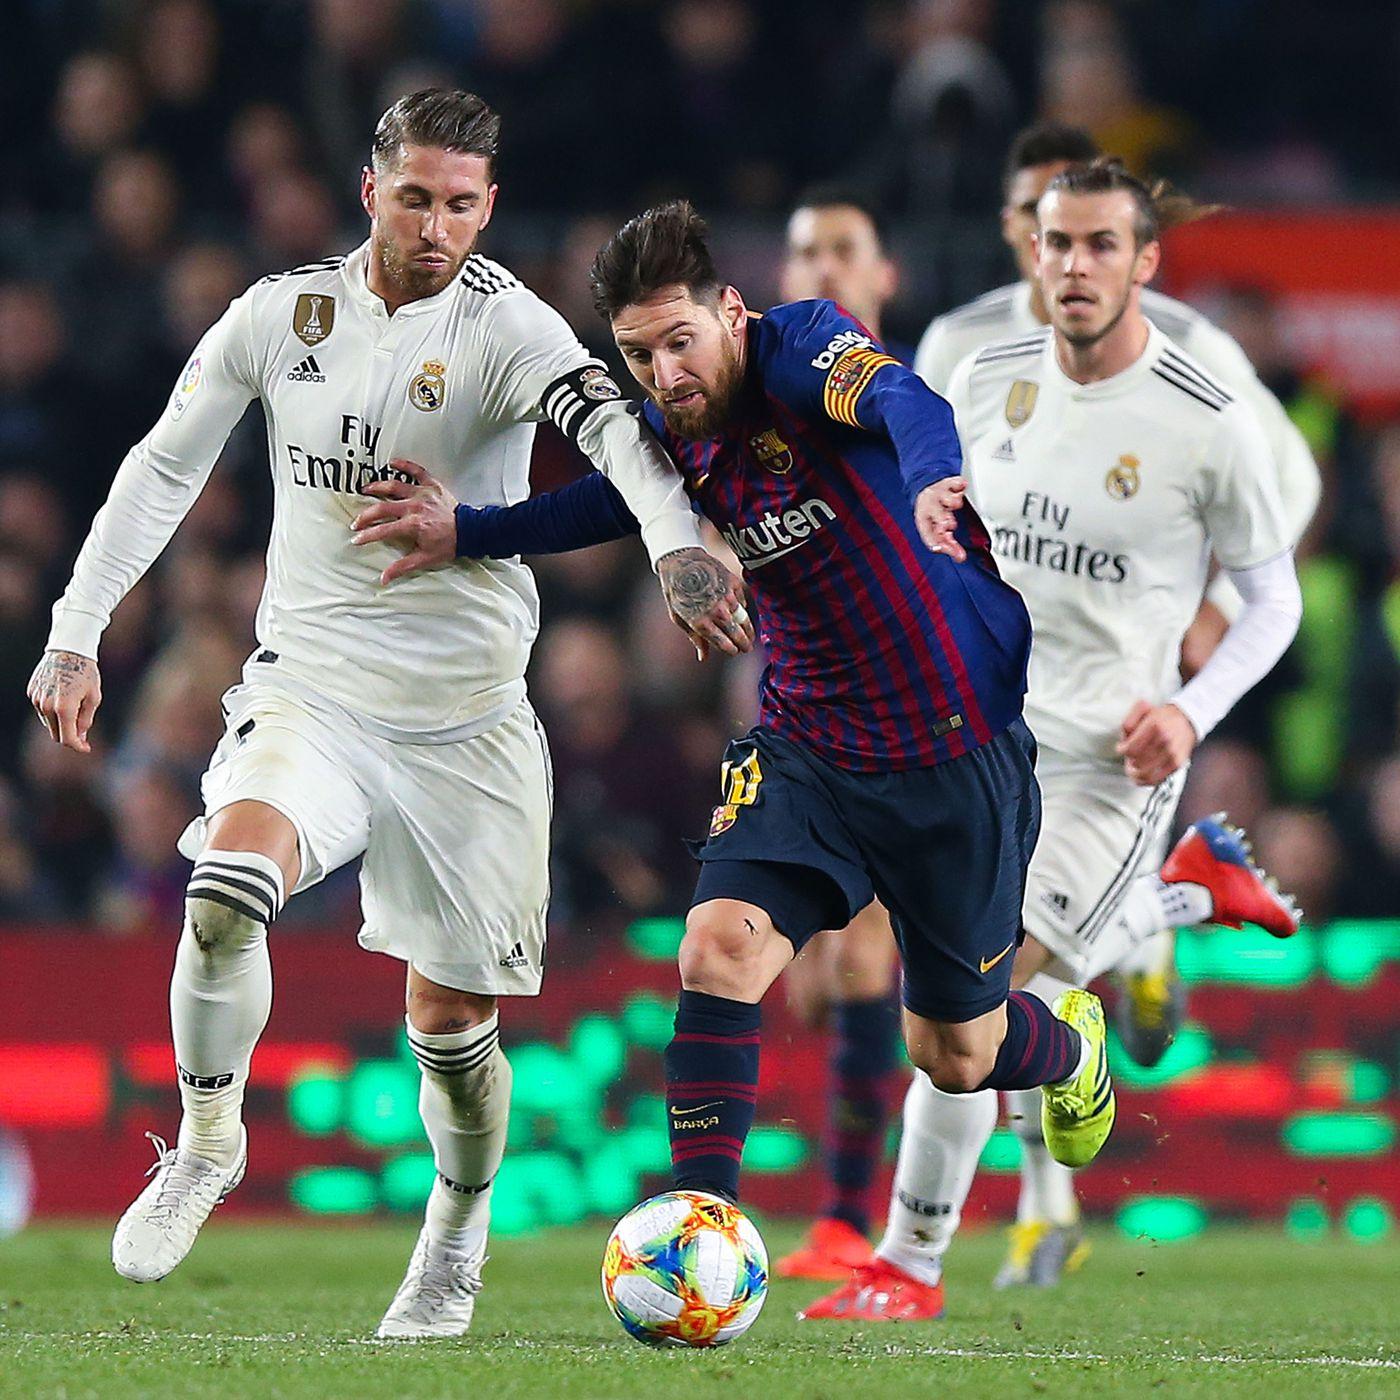 Predicted Lineups Fc Barcelona Vs Real Madrid 2019 El Clasico Managing Madrid